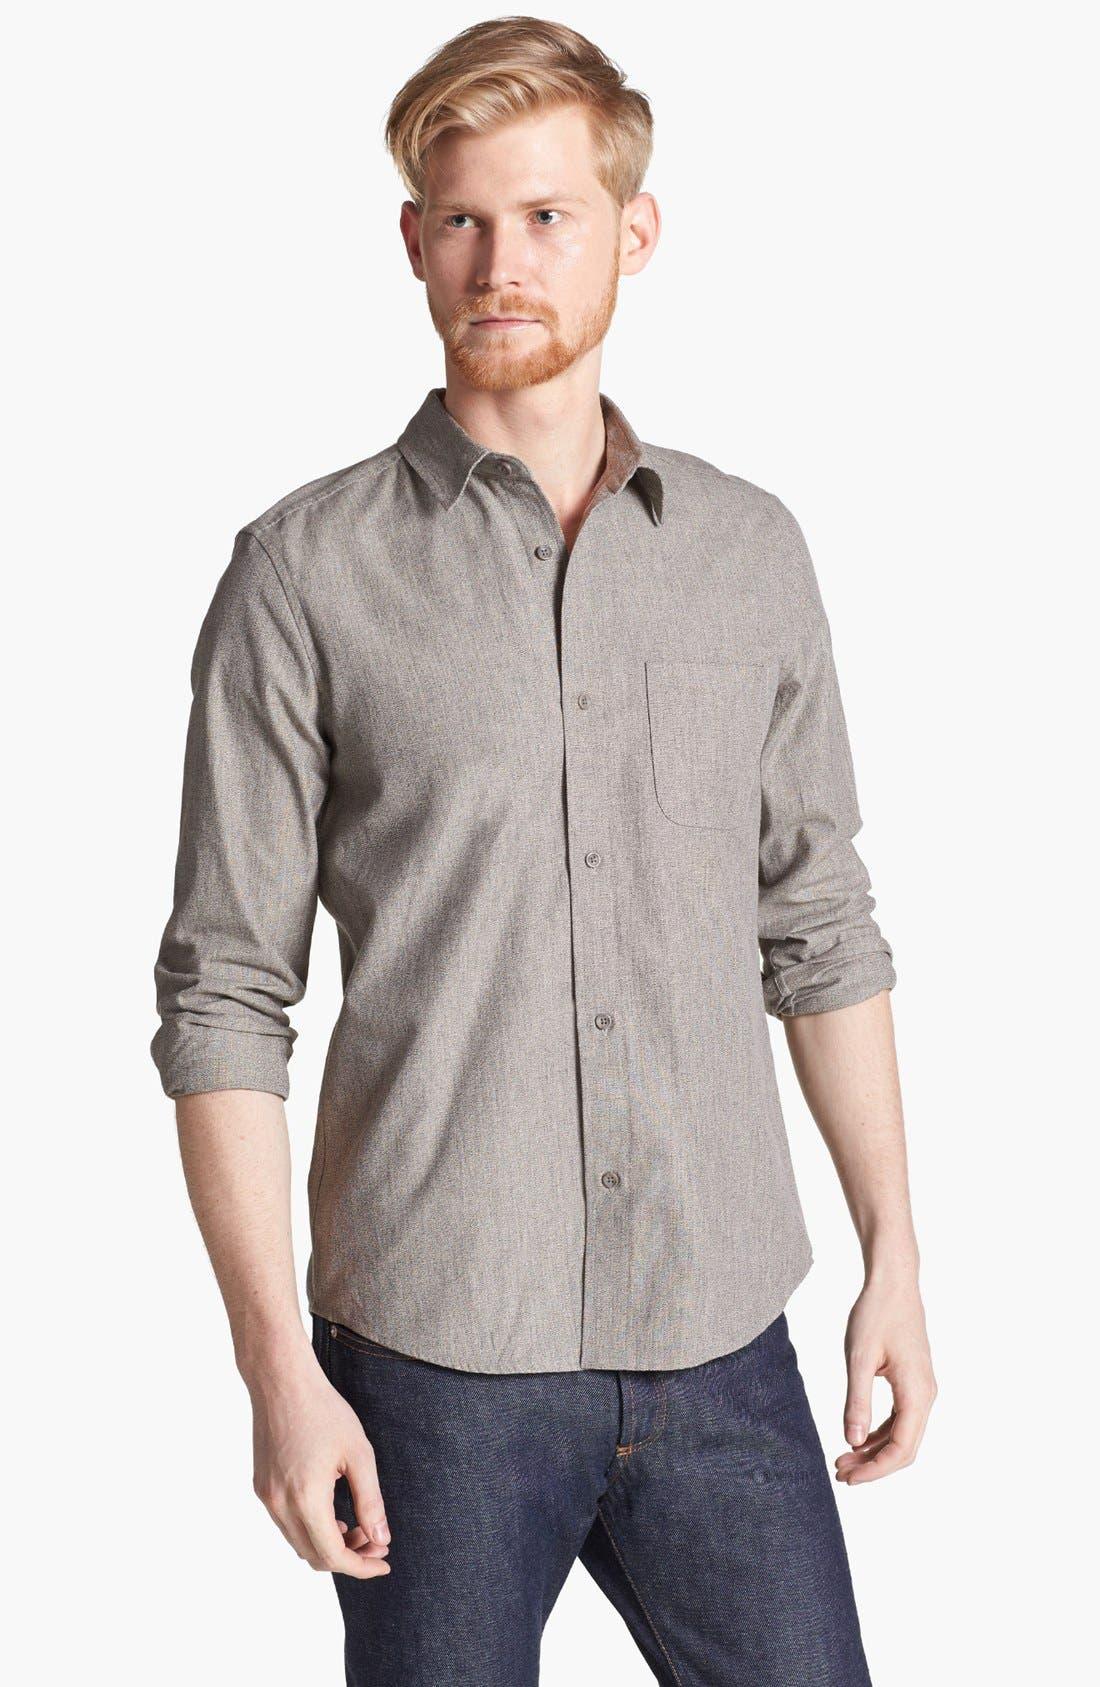 Alternate Image 1 Selected - Pendleton Portland Collection 'Yachats' Cotton Shirt